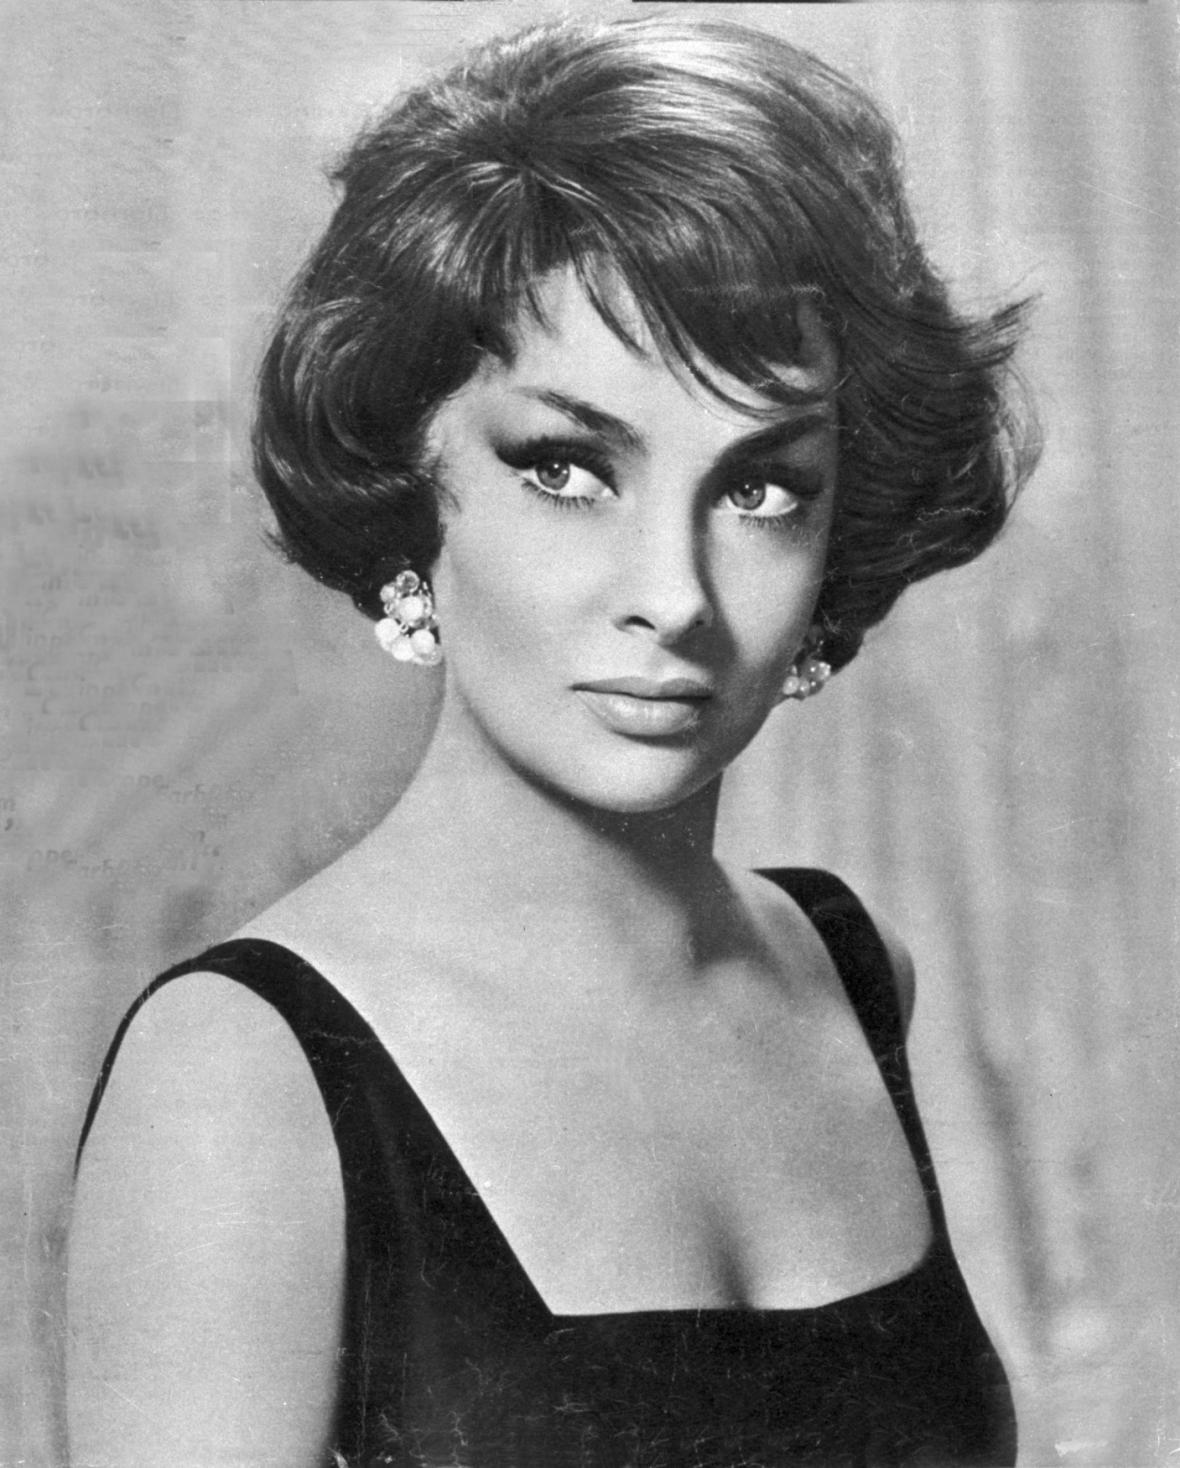 Gina Lollobrigida (1964)